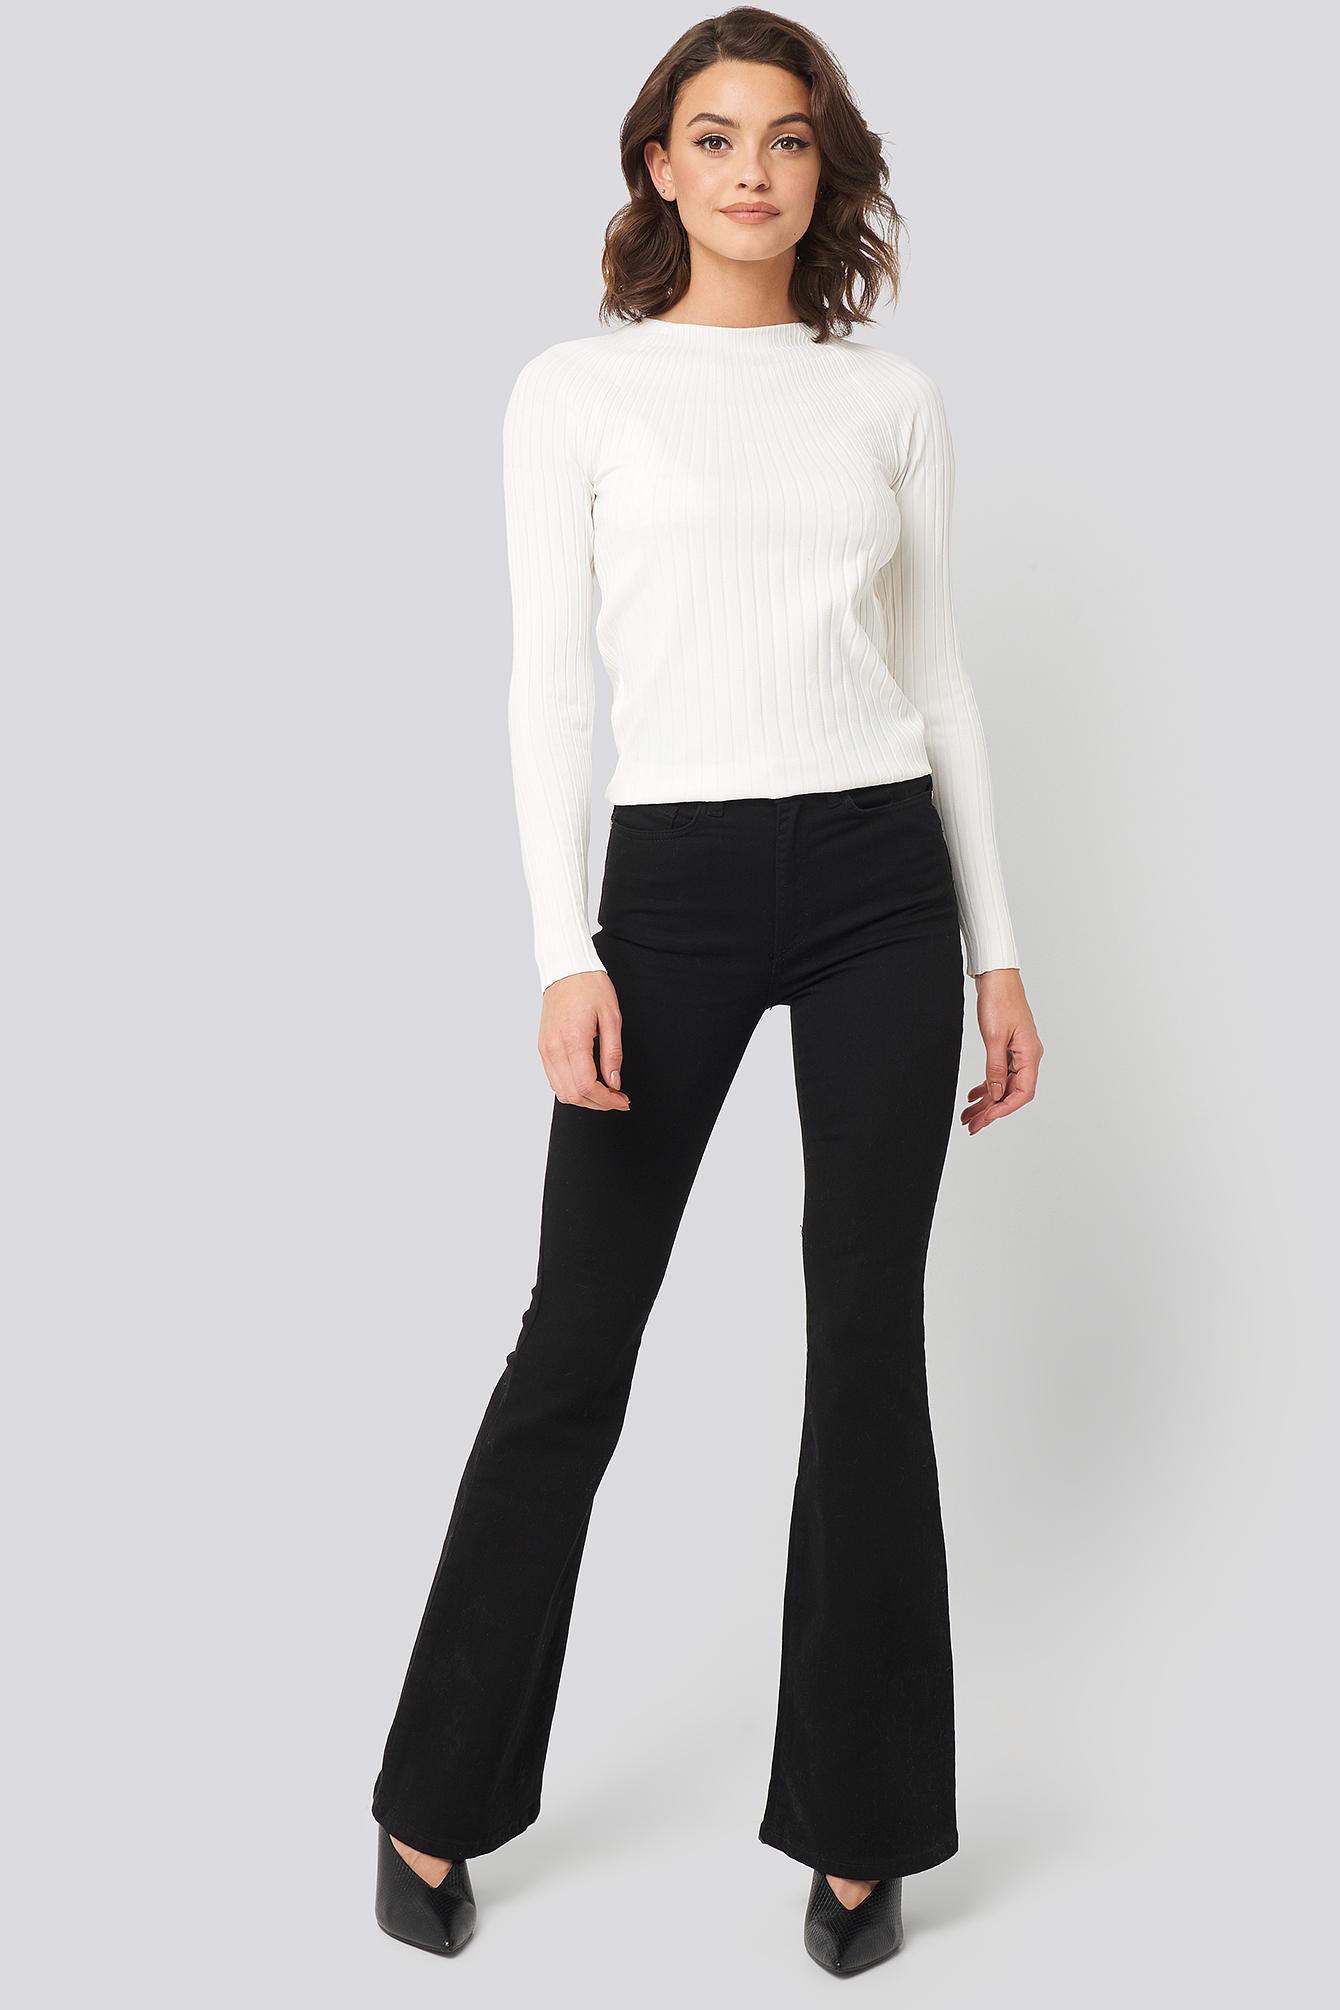 trendyol -  High Waist Flare Jeans - Black